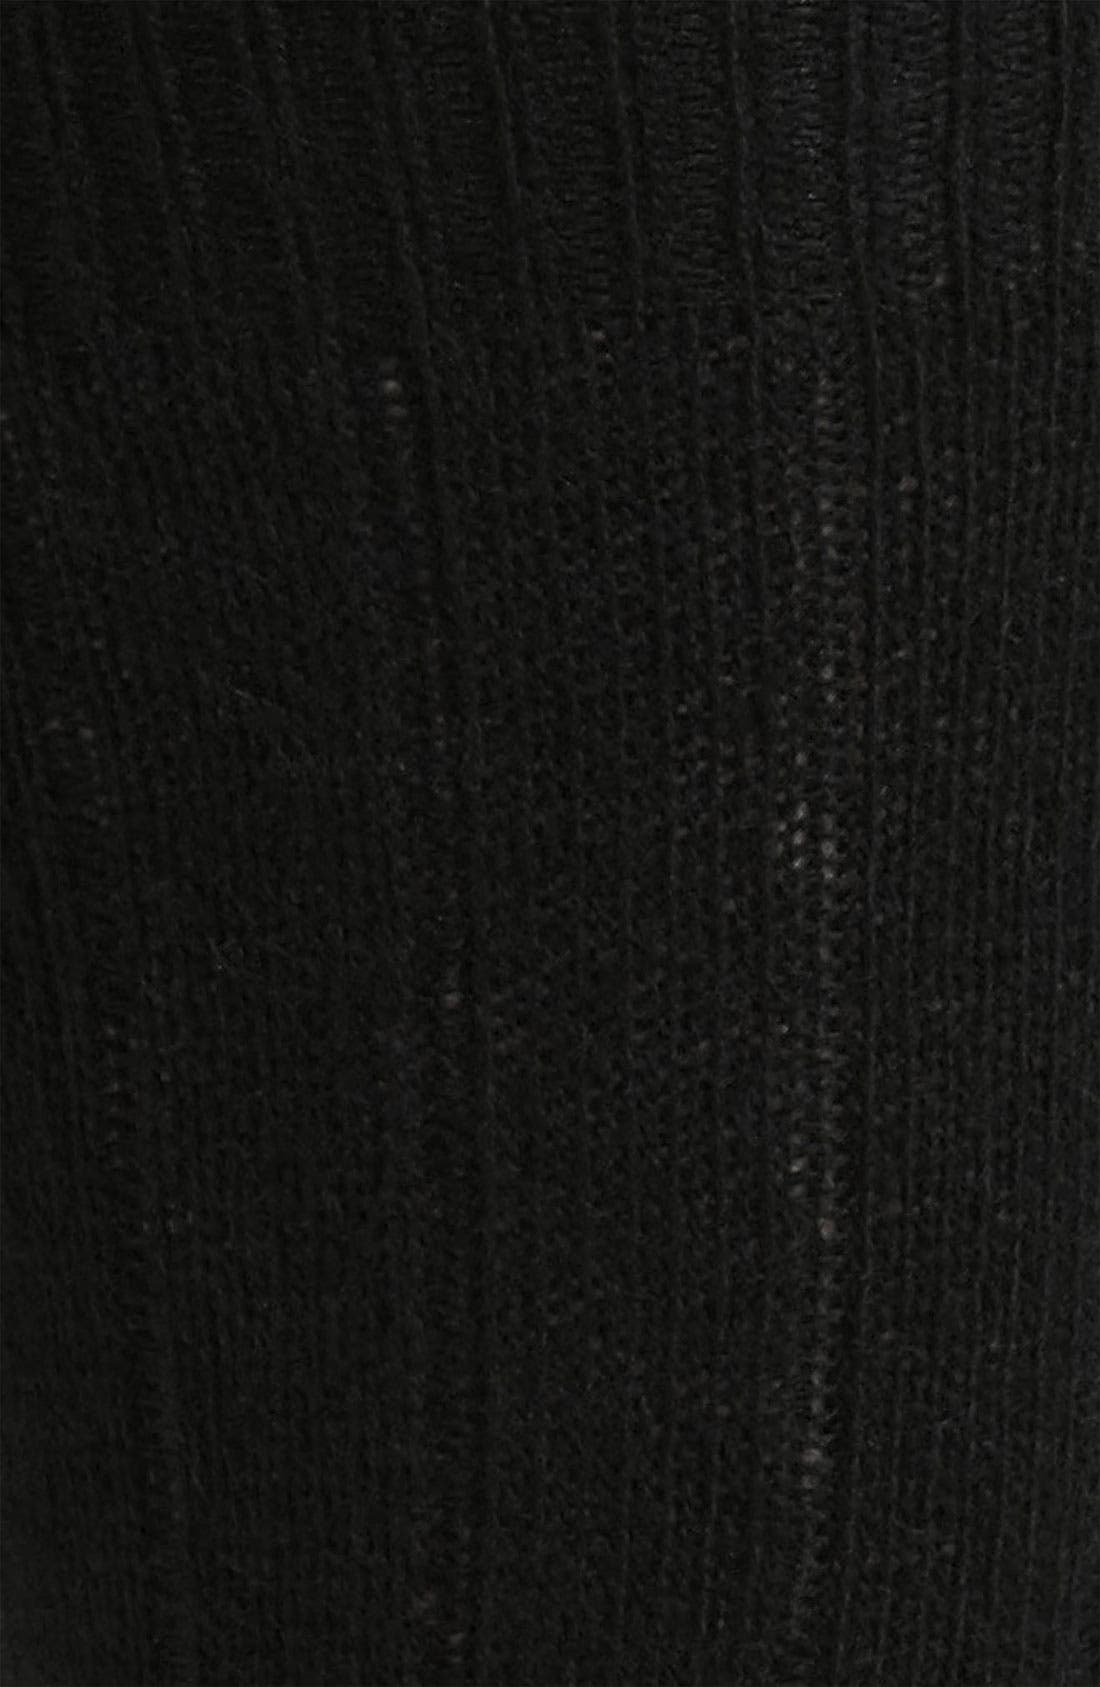 Cashmere Blend Socks,                             Alternate thumbnail 3, color,                             BLK